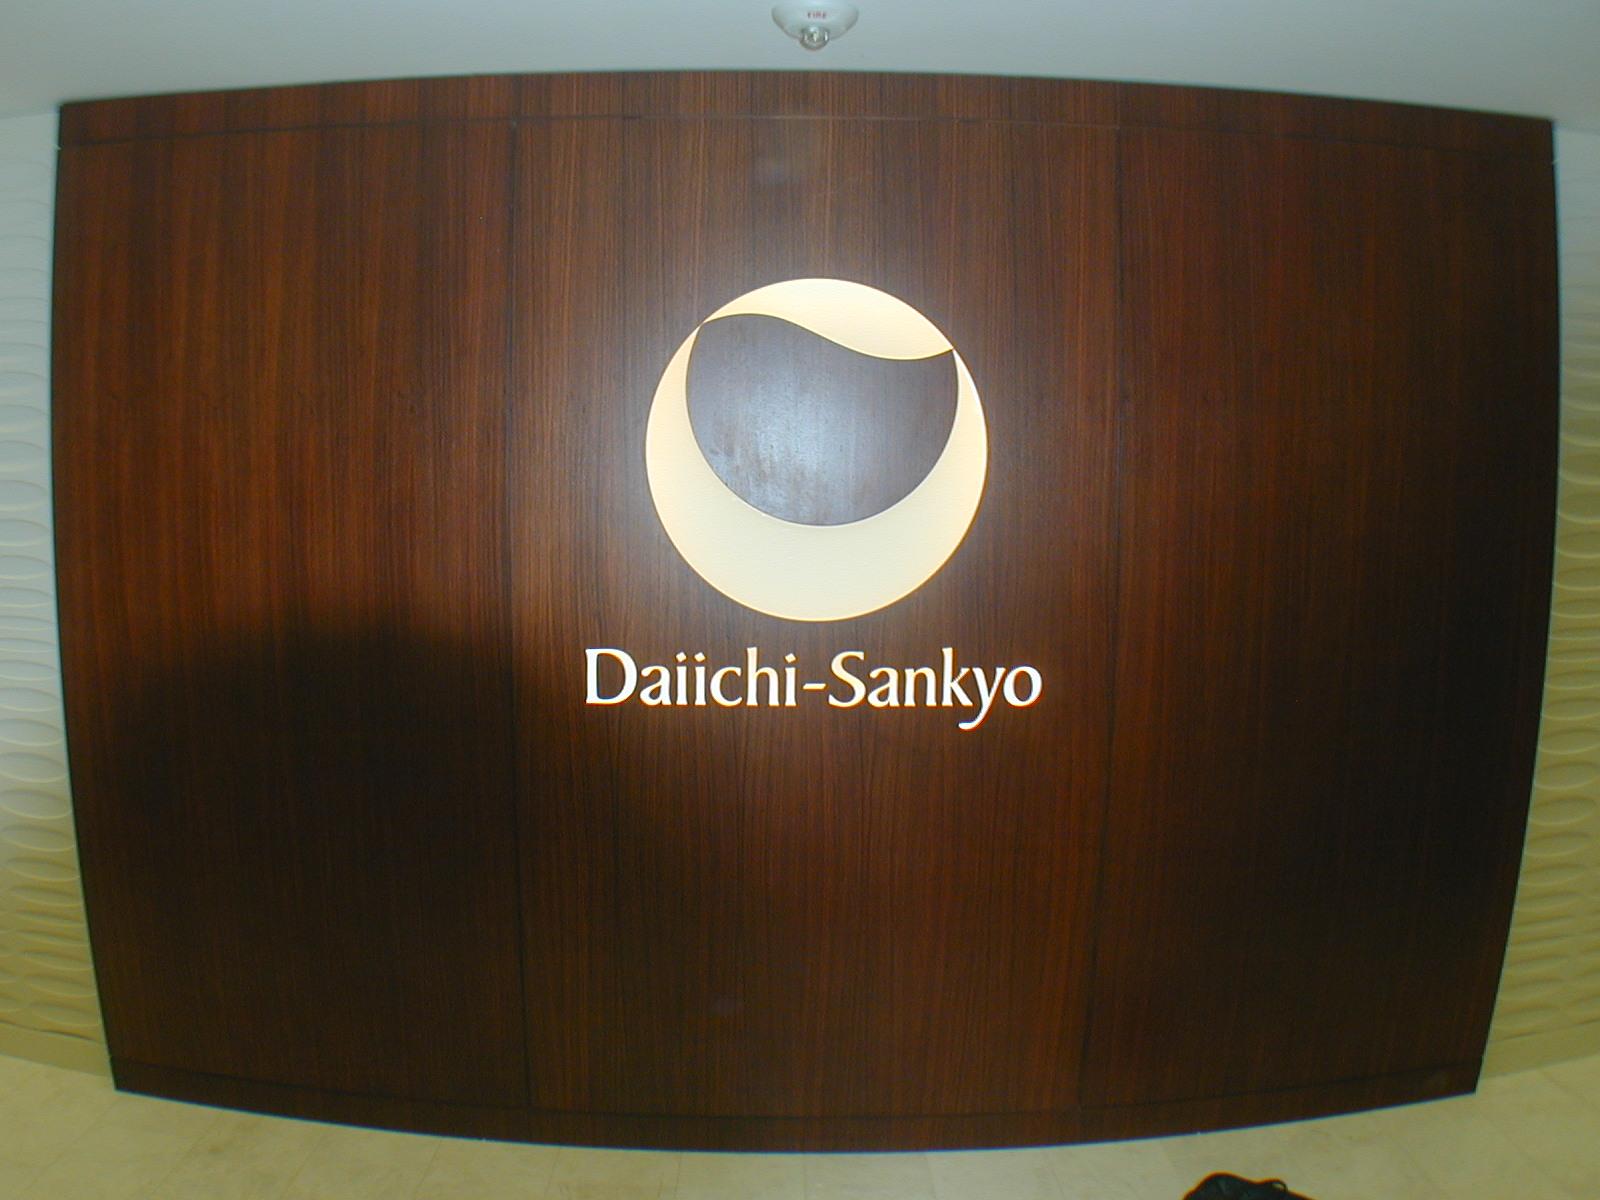 m_projects_0- Old Jobs_Daiichi Sankyo_Pics_P1010153.JPG